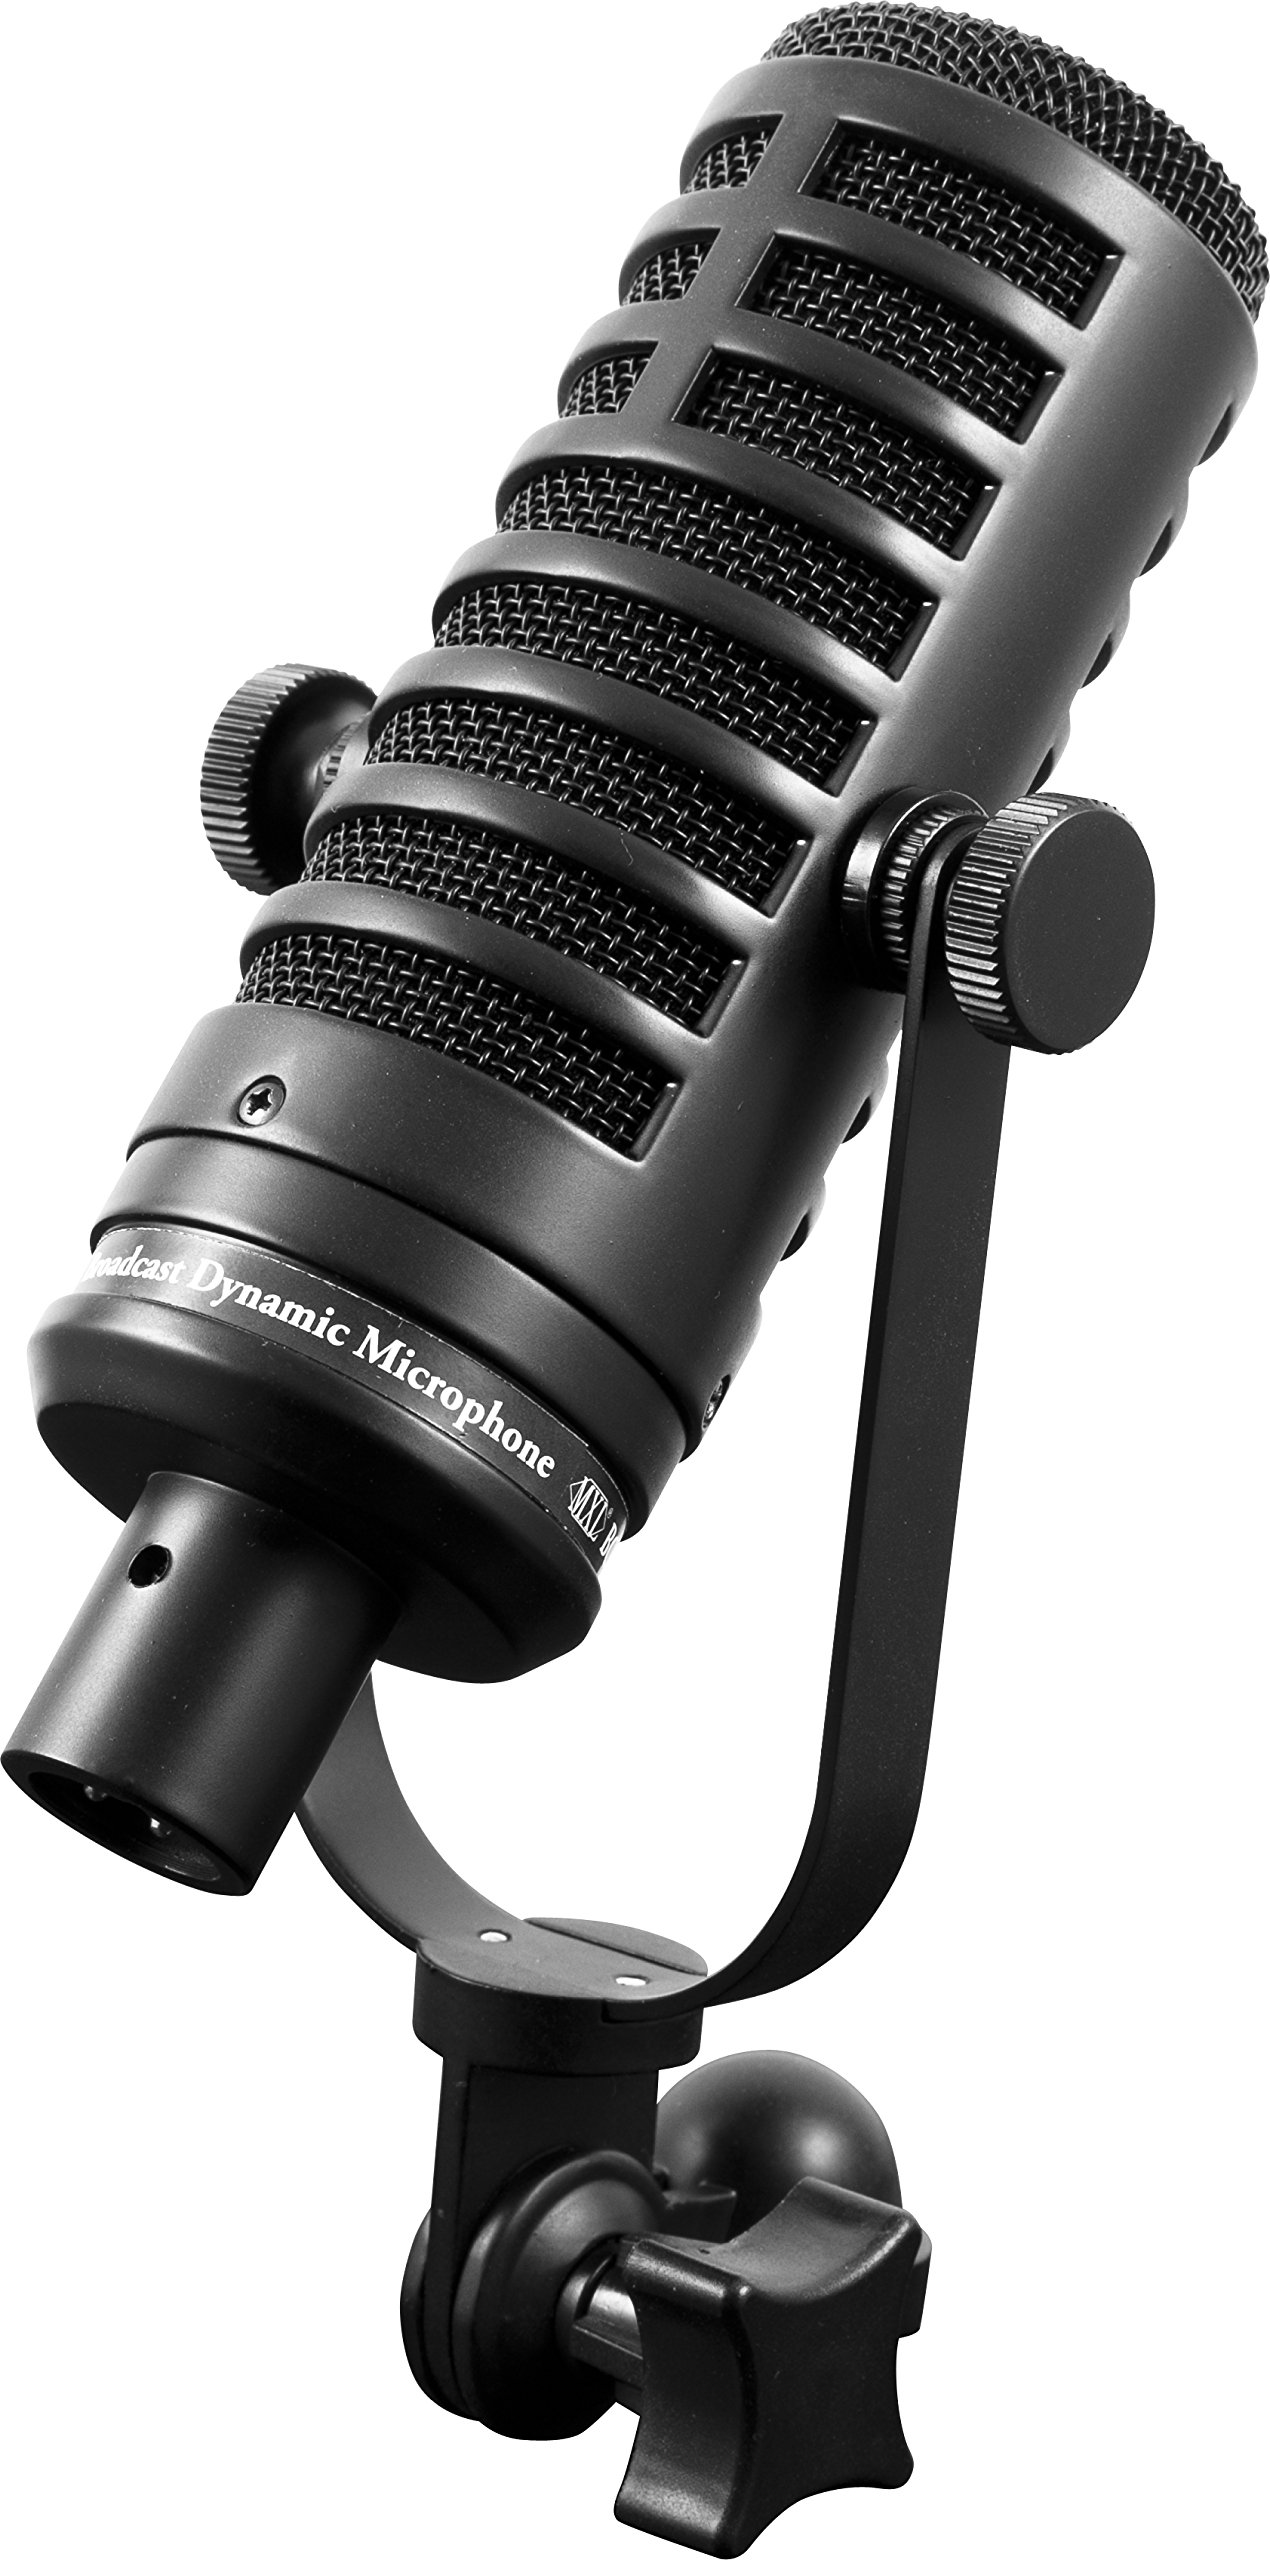 MXL Mics Dynamic Microphone, XLR Connector, Black, 6.20 x 2.00 x 2.00 inches (MXL BCD-1) by MXL Mics